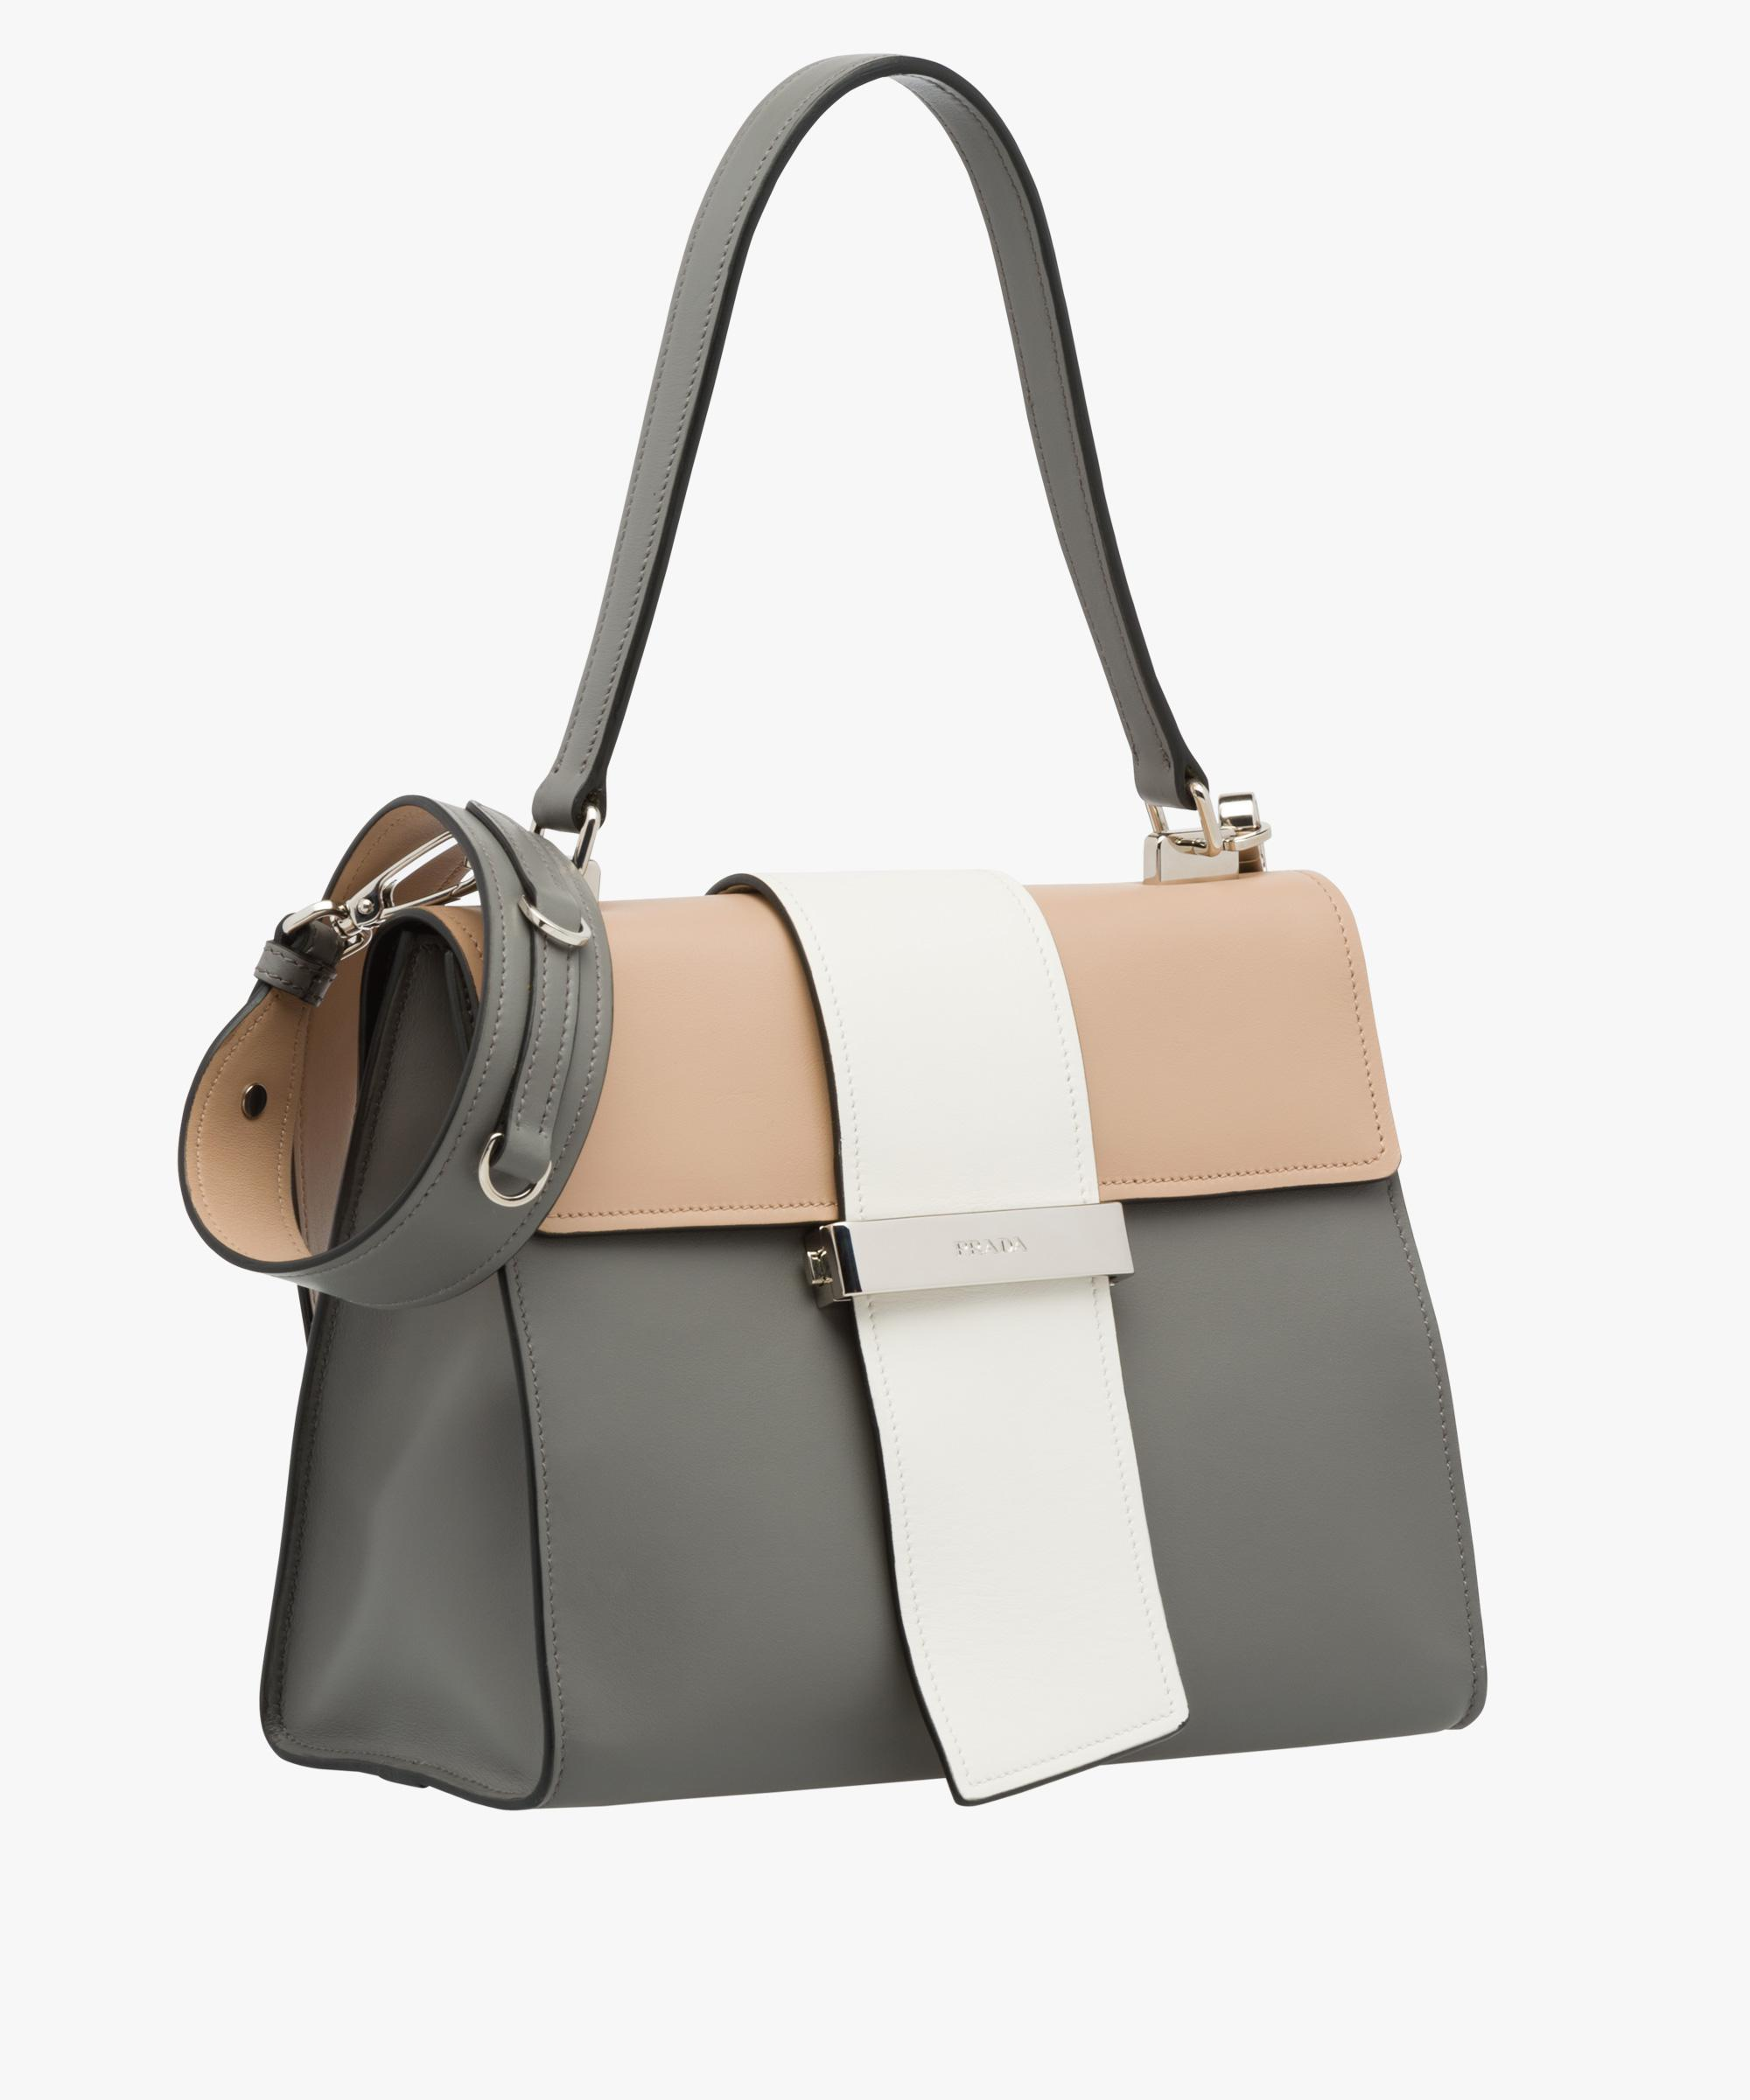 9d834faadc364f Prada Metal Ribbon Leather Shoulder Bag - Lyst